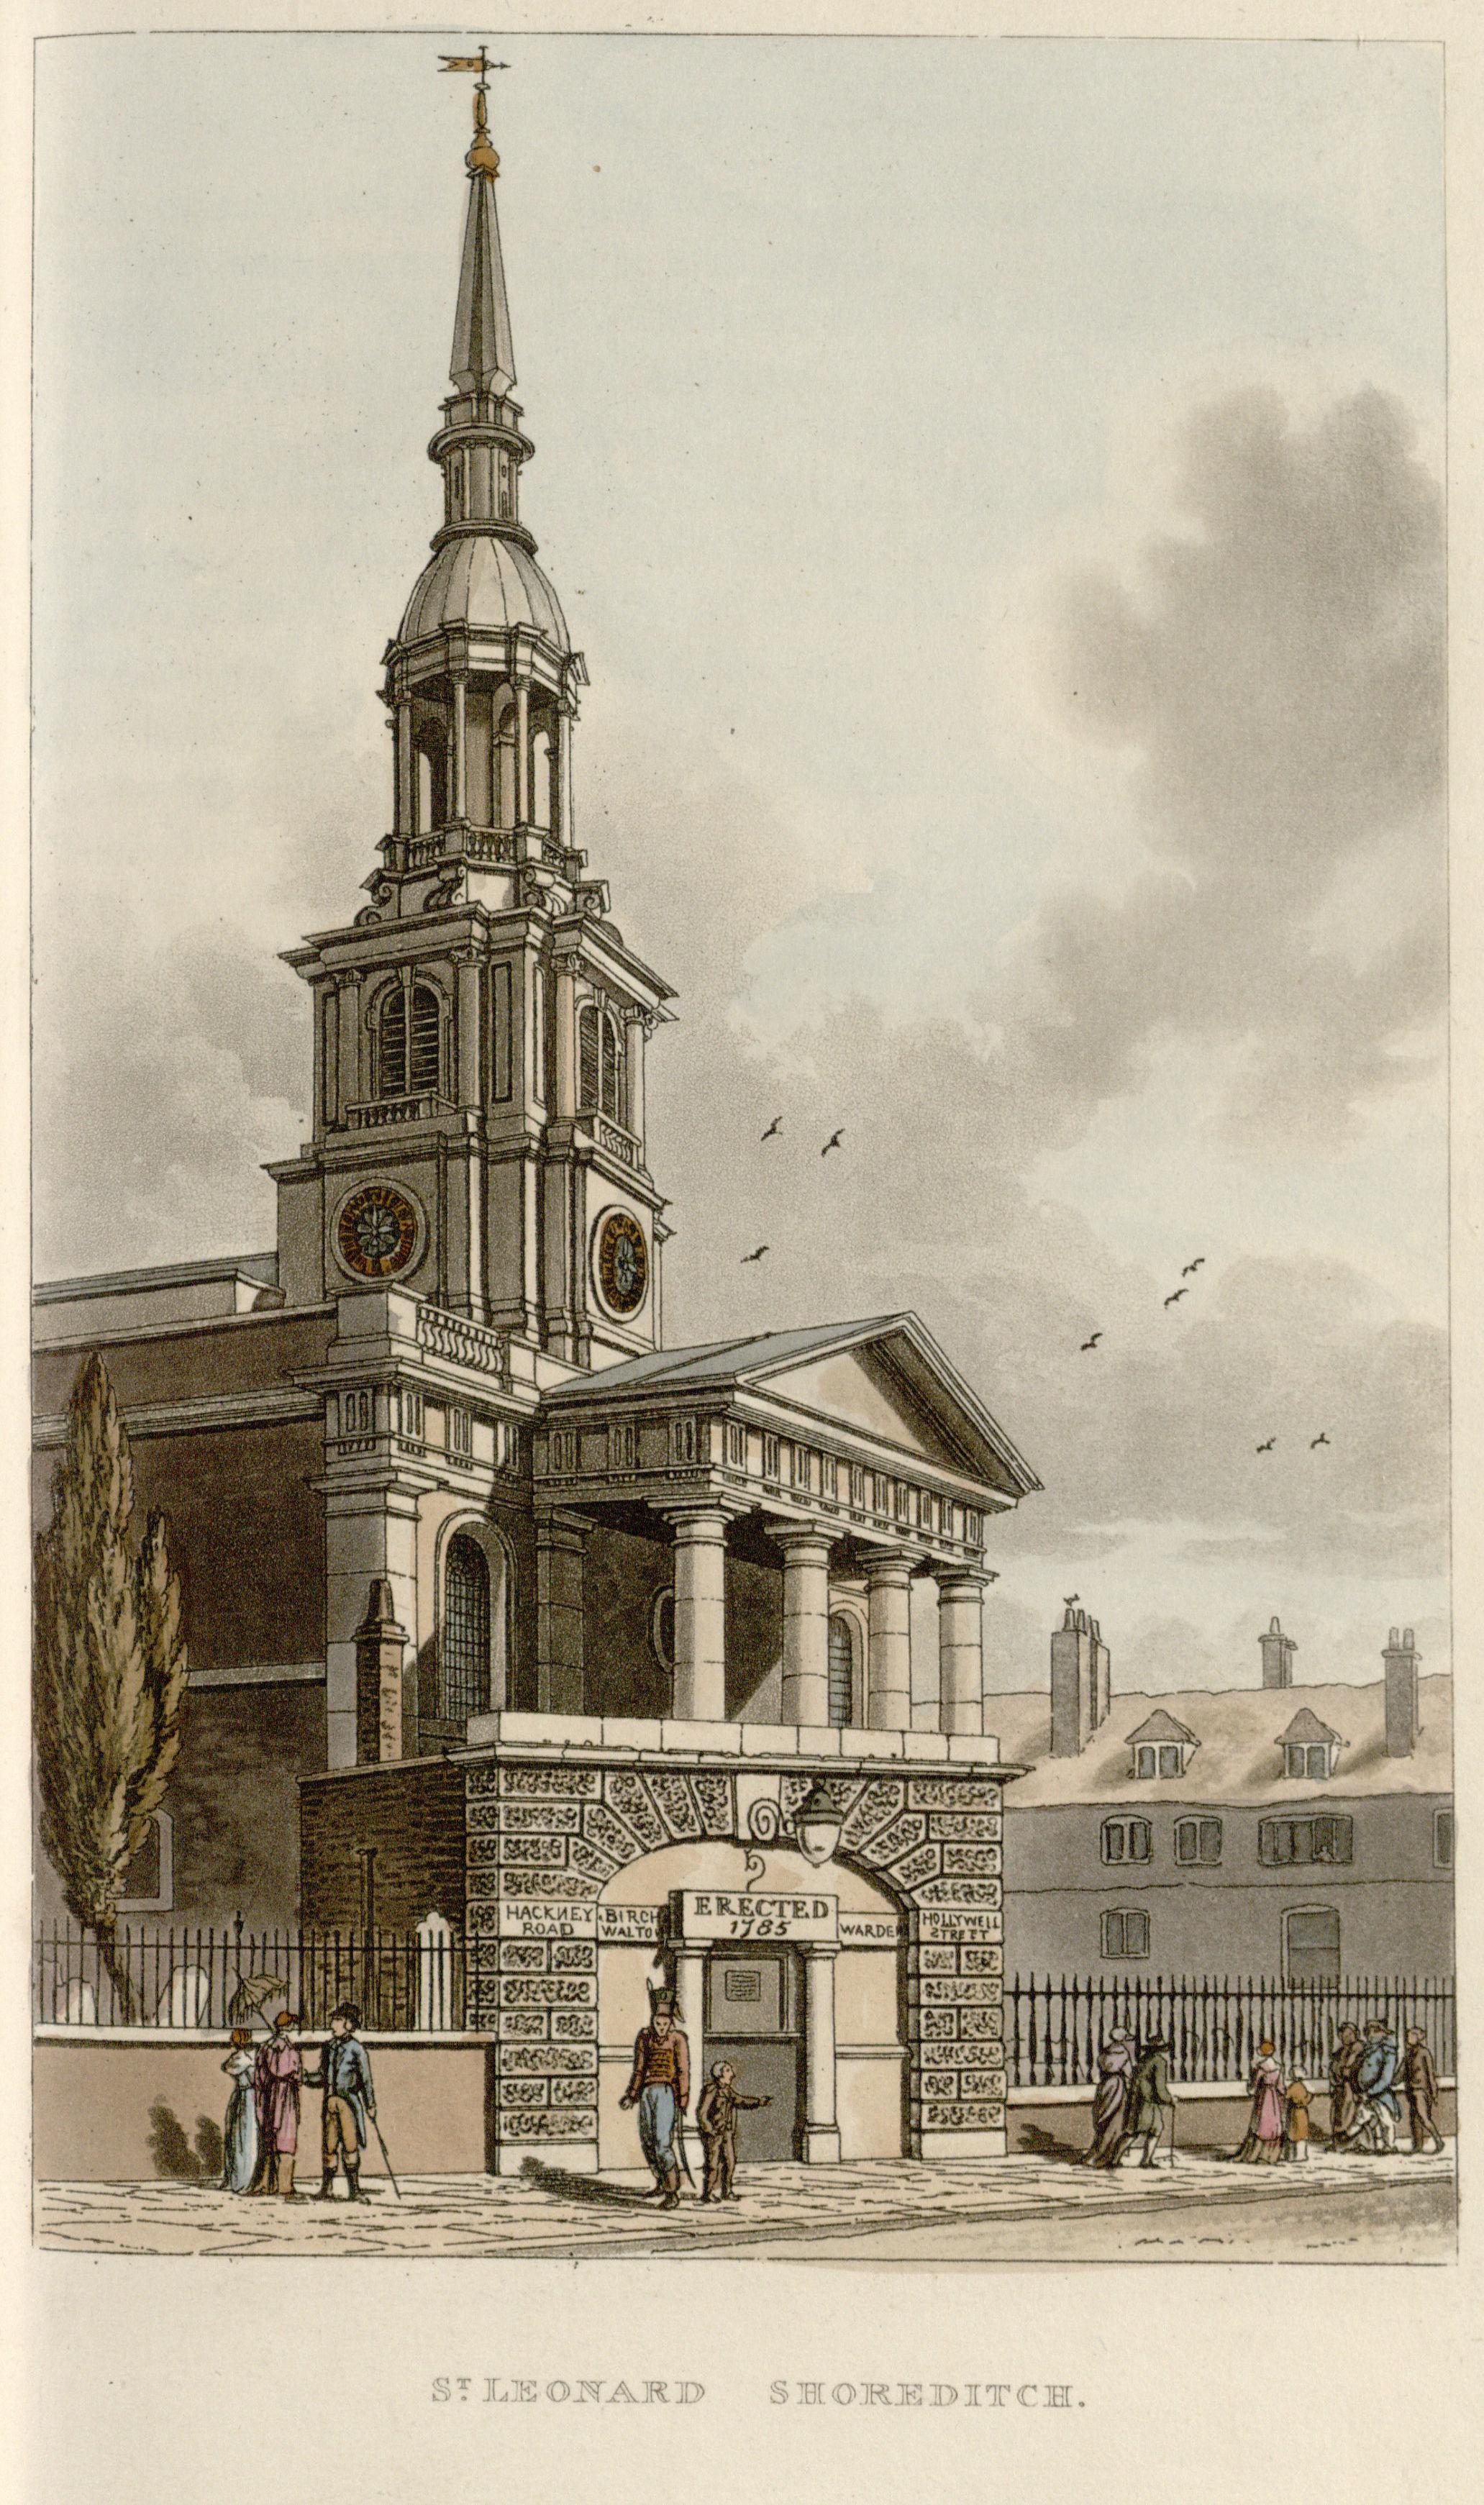 60 - Papworth - St Leonard Shoreditch